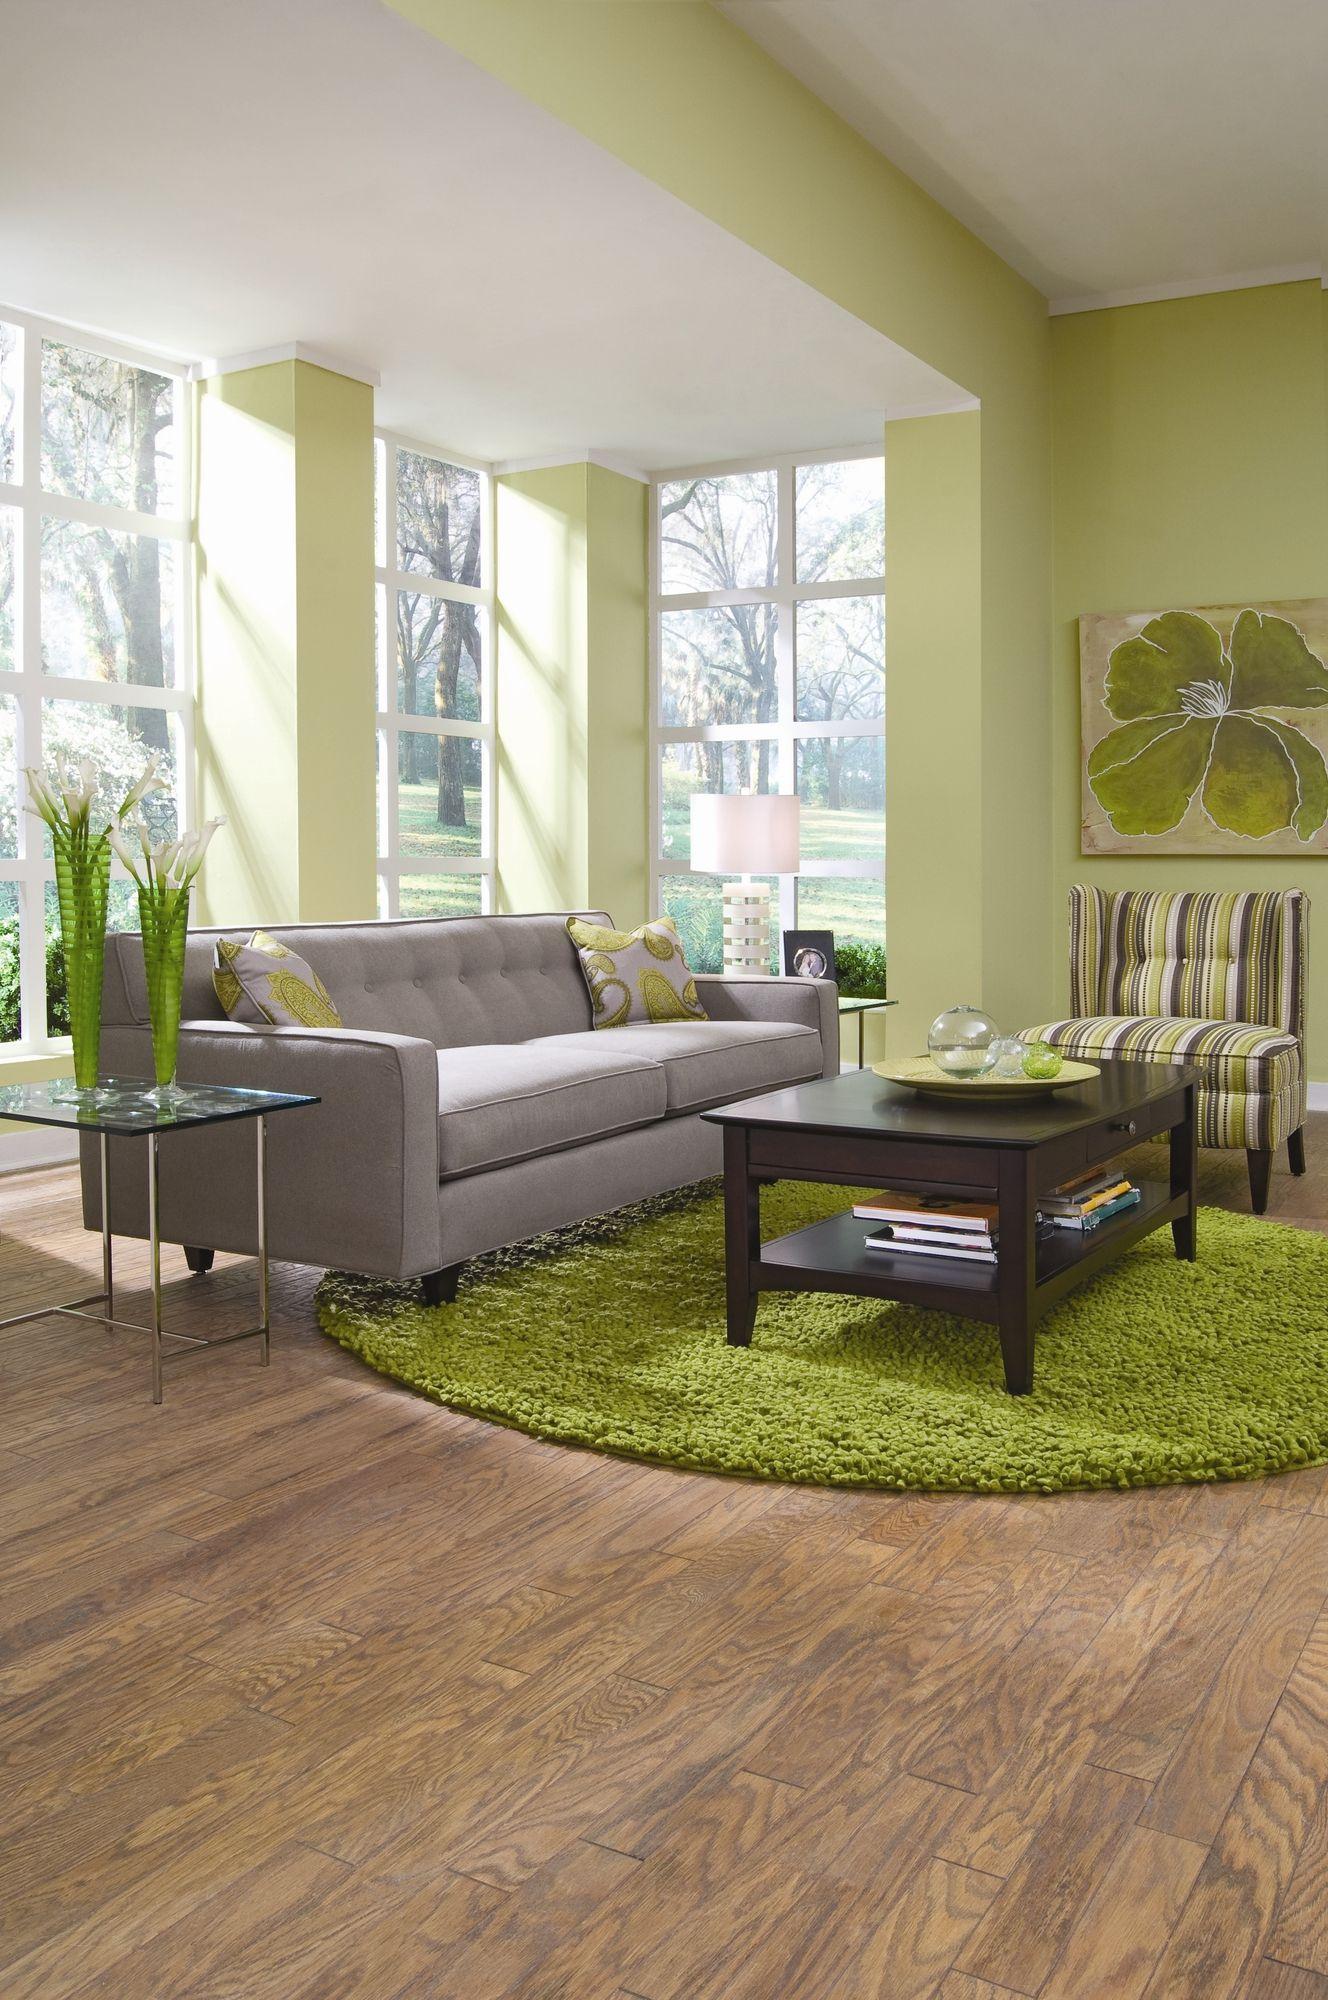 Rowe Furniture Dorset Sofa Living Room Sofa Living Room